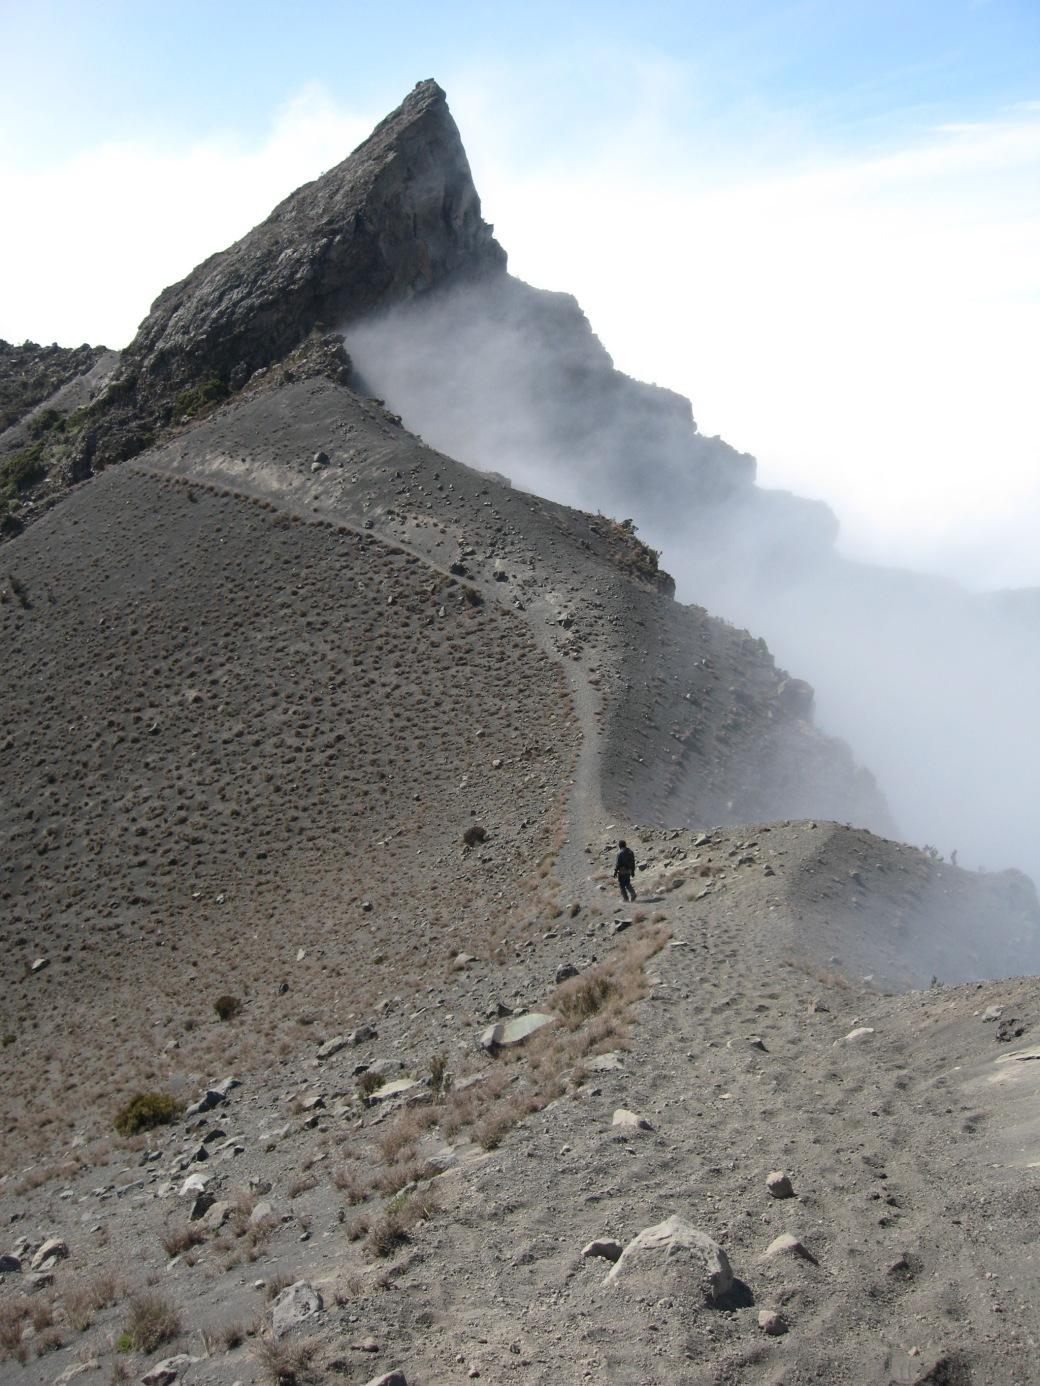 Mount_Meru,_Tanzania.jpg